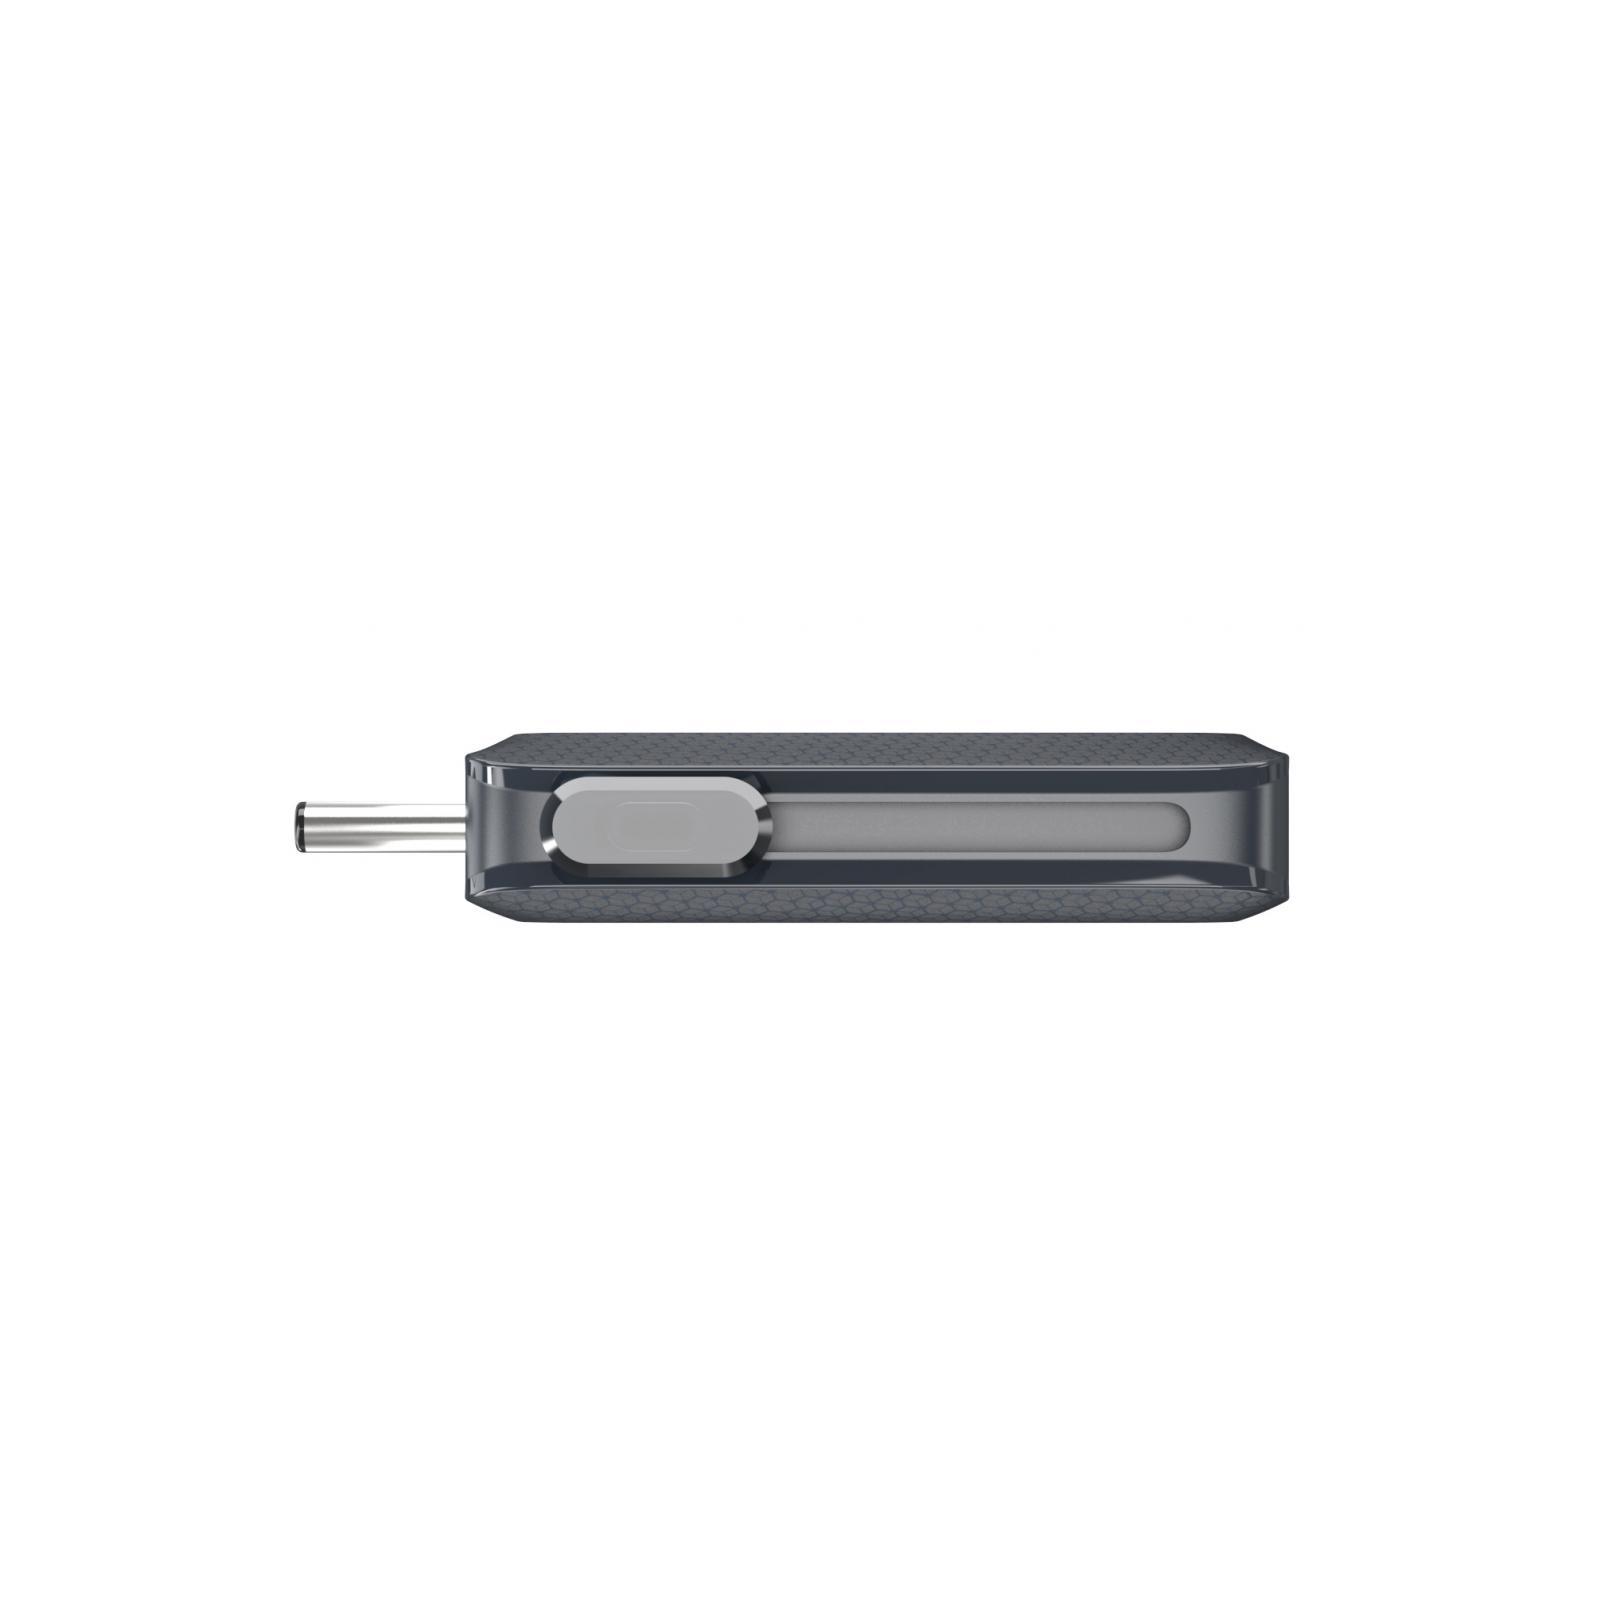 USB флеш накопитель SanDisk 128GB Ultra Dual Drive M3.0 USB 3.0 (SDDD3-128G-G46) изображение 9